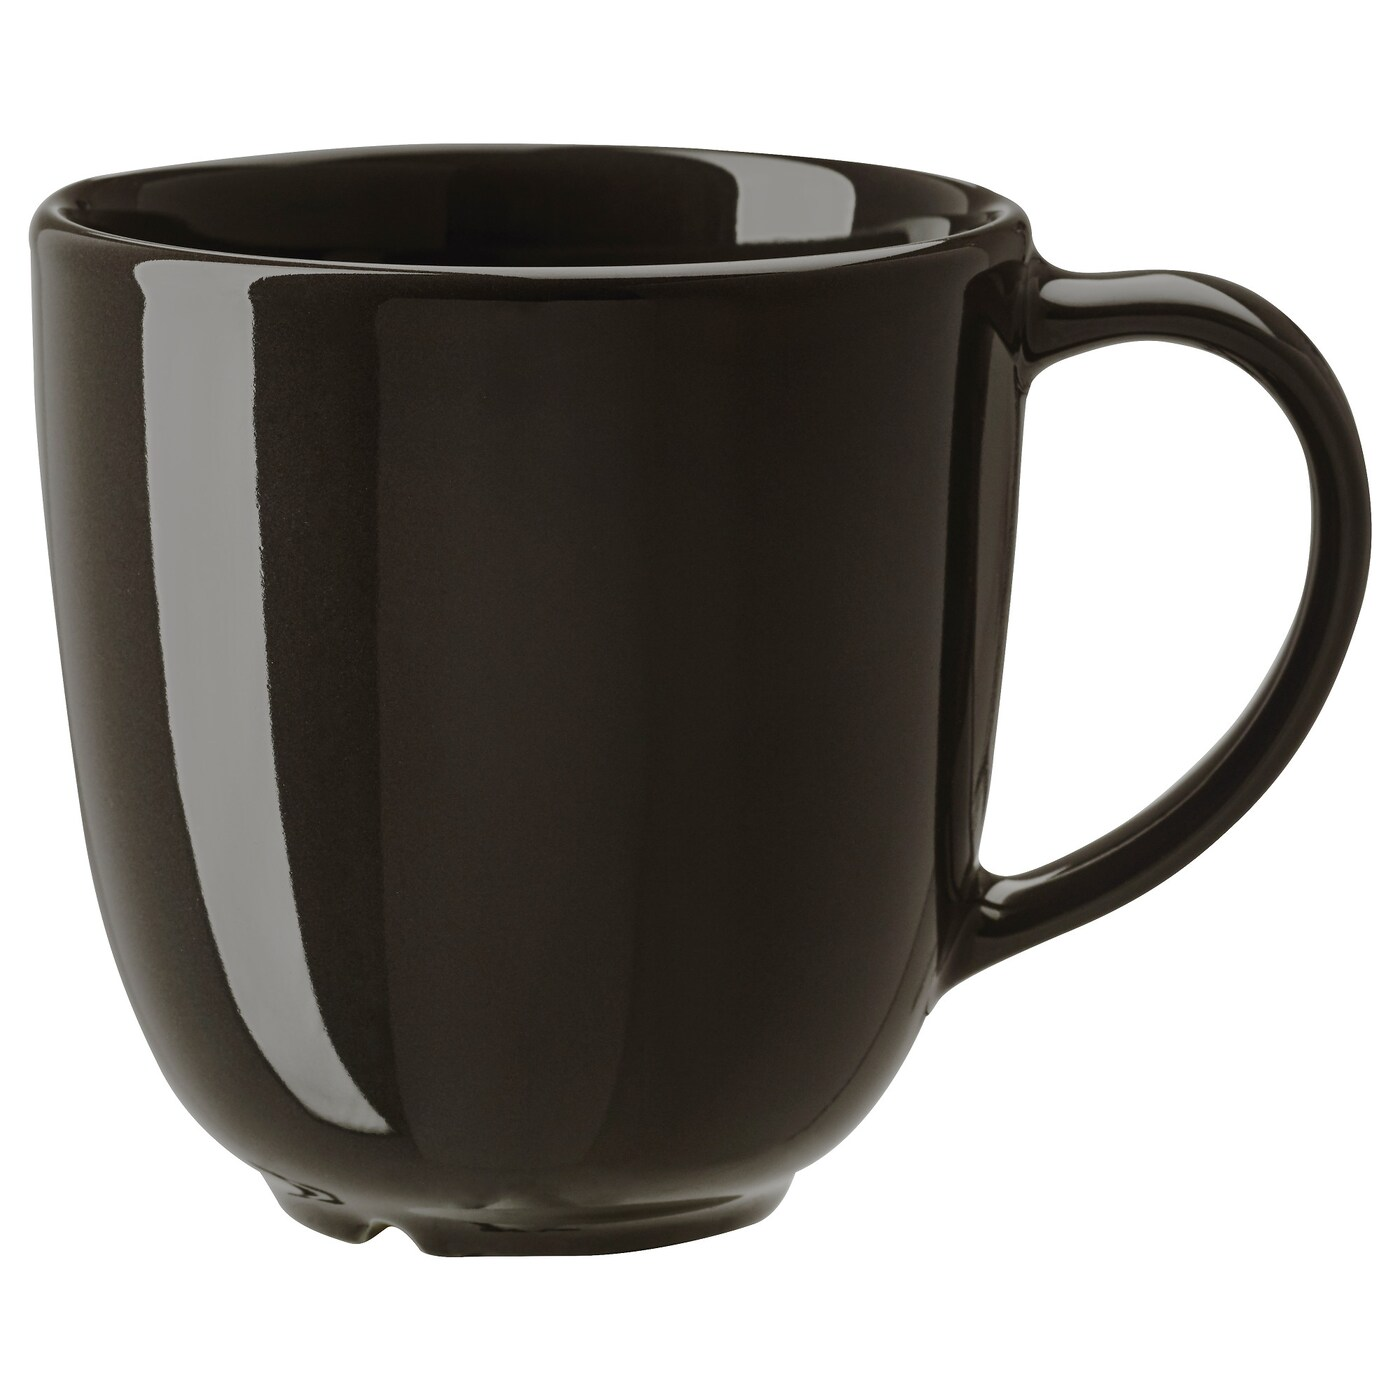 Tableware crockery ikea for Ikea coffee cup holder